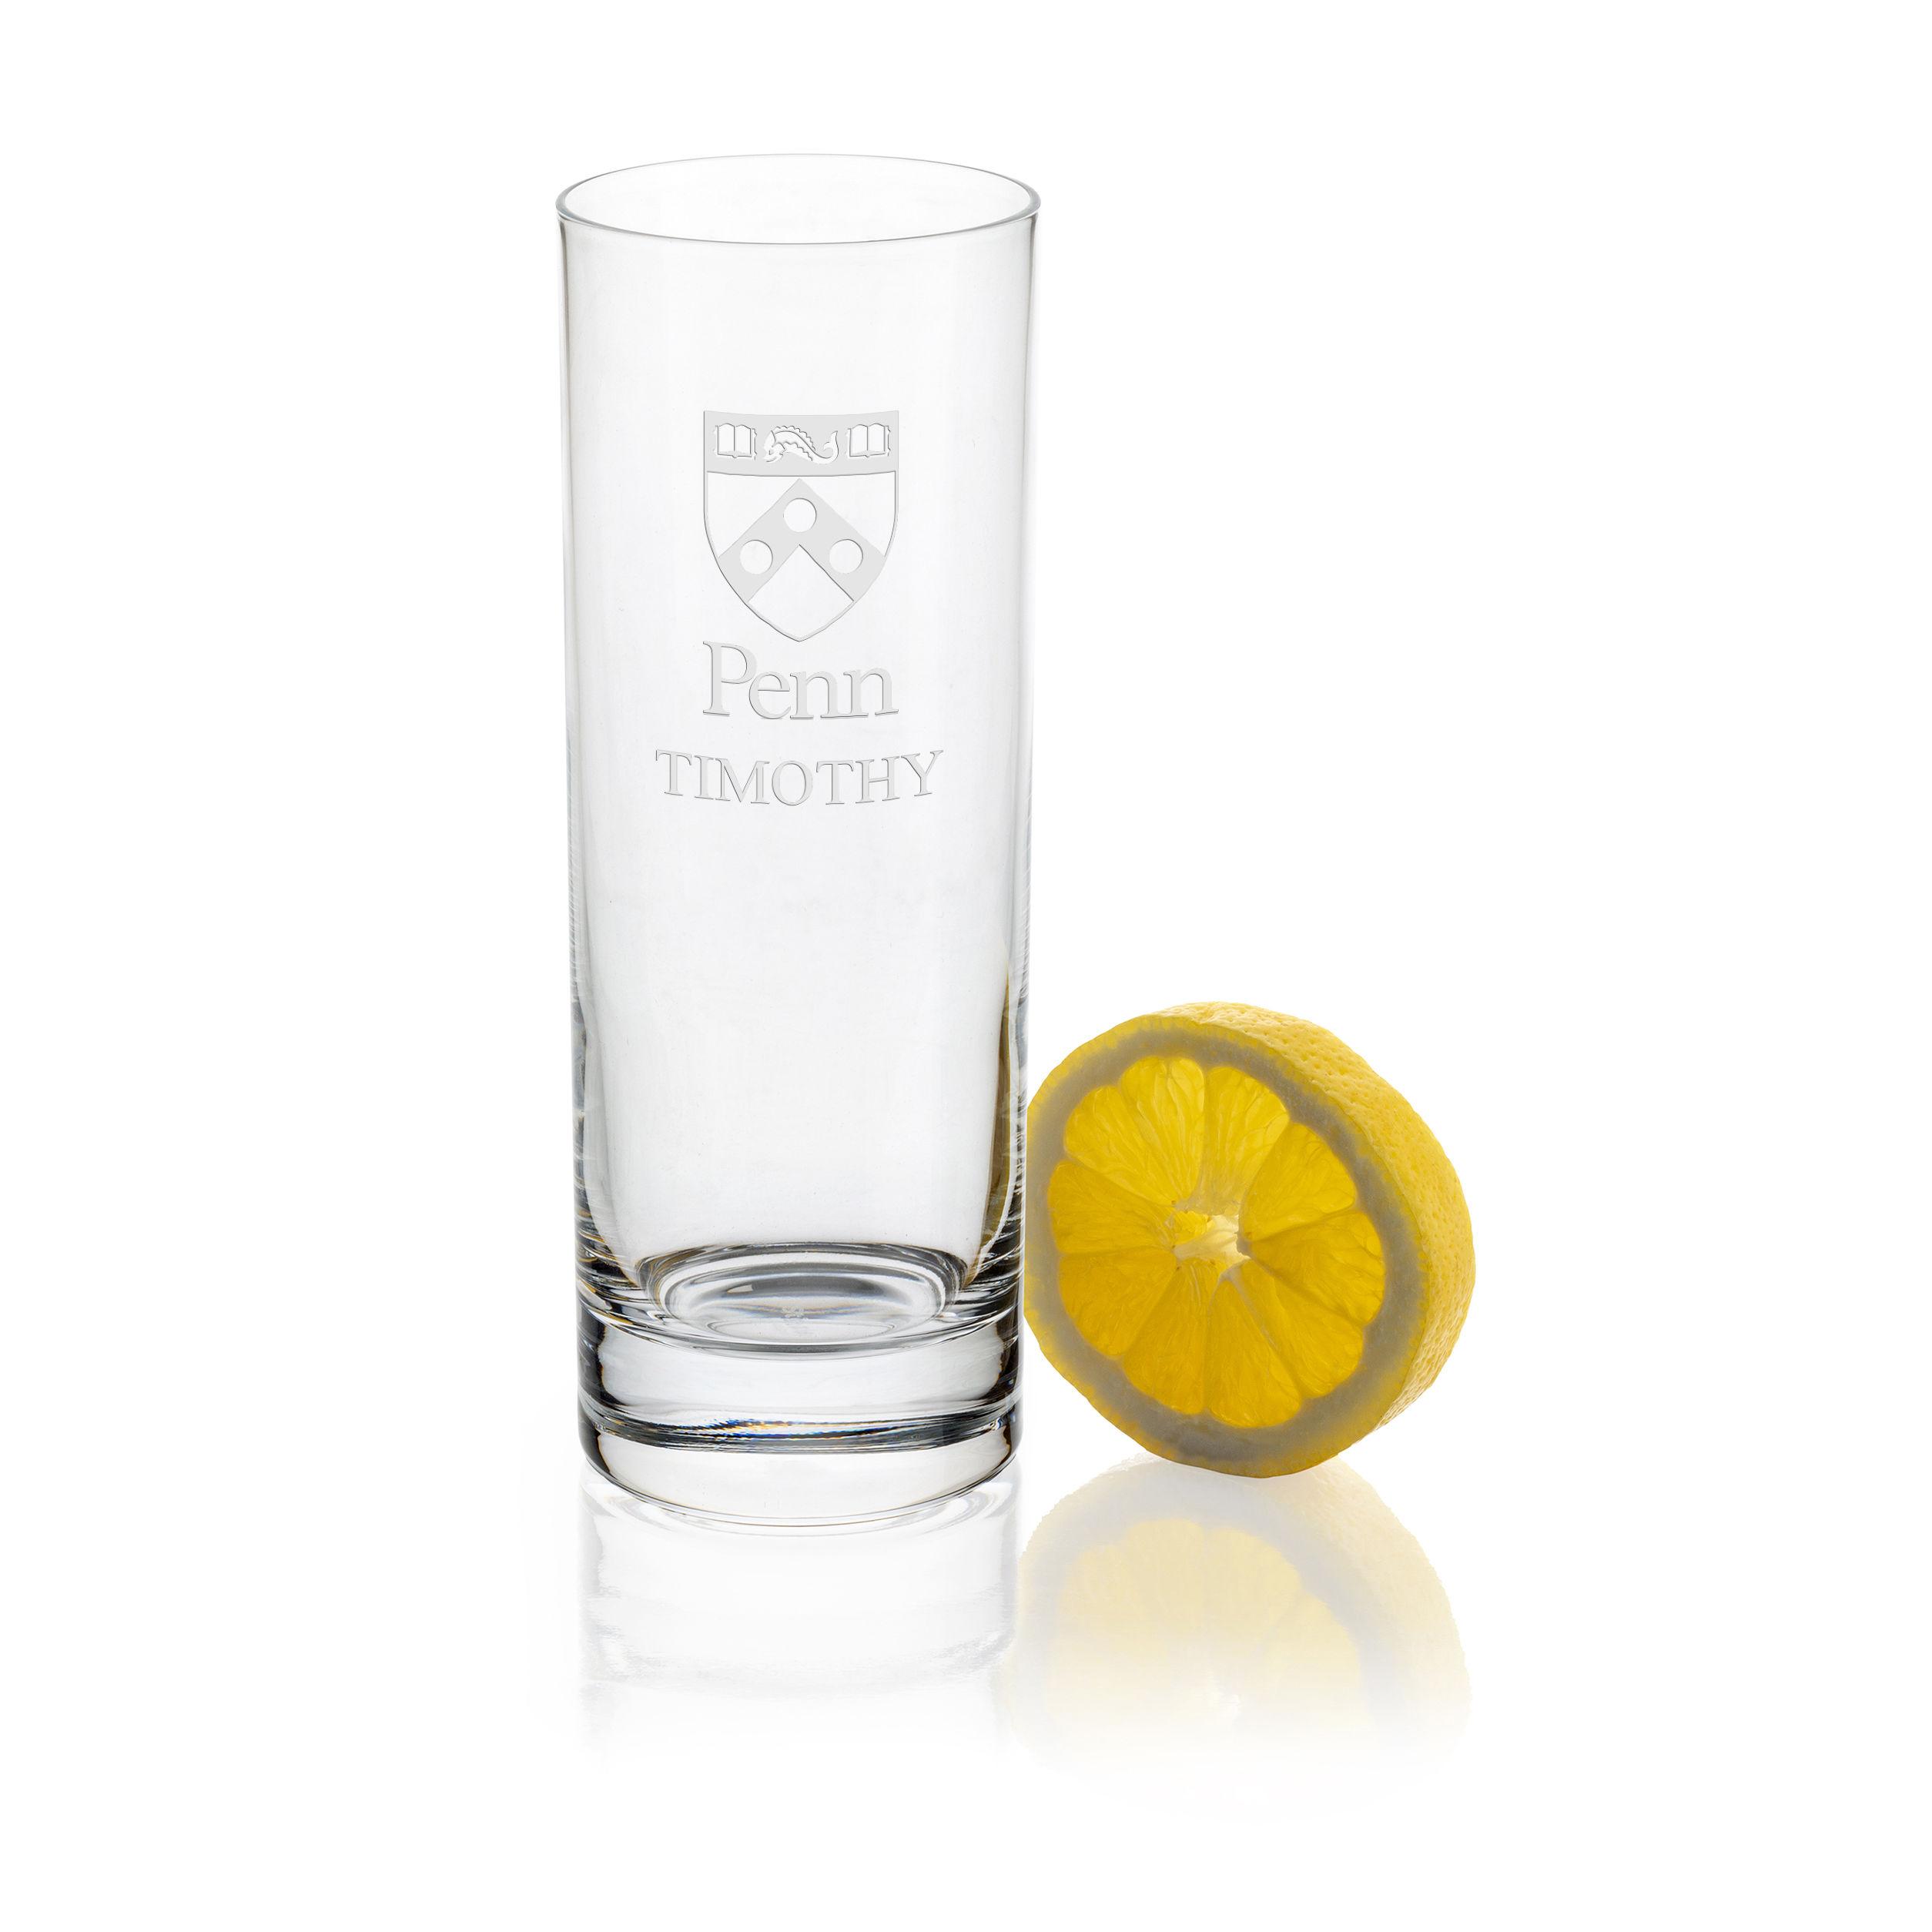 University of Pennsylvania Iced Beverage Glasses - Set of 4